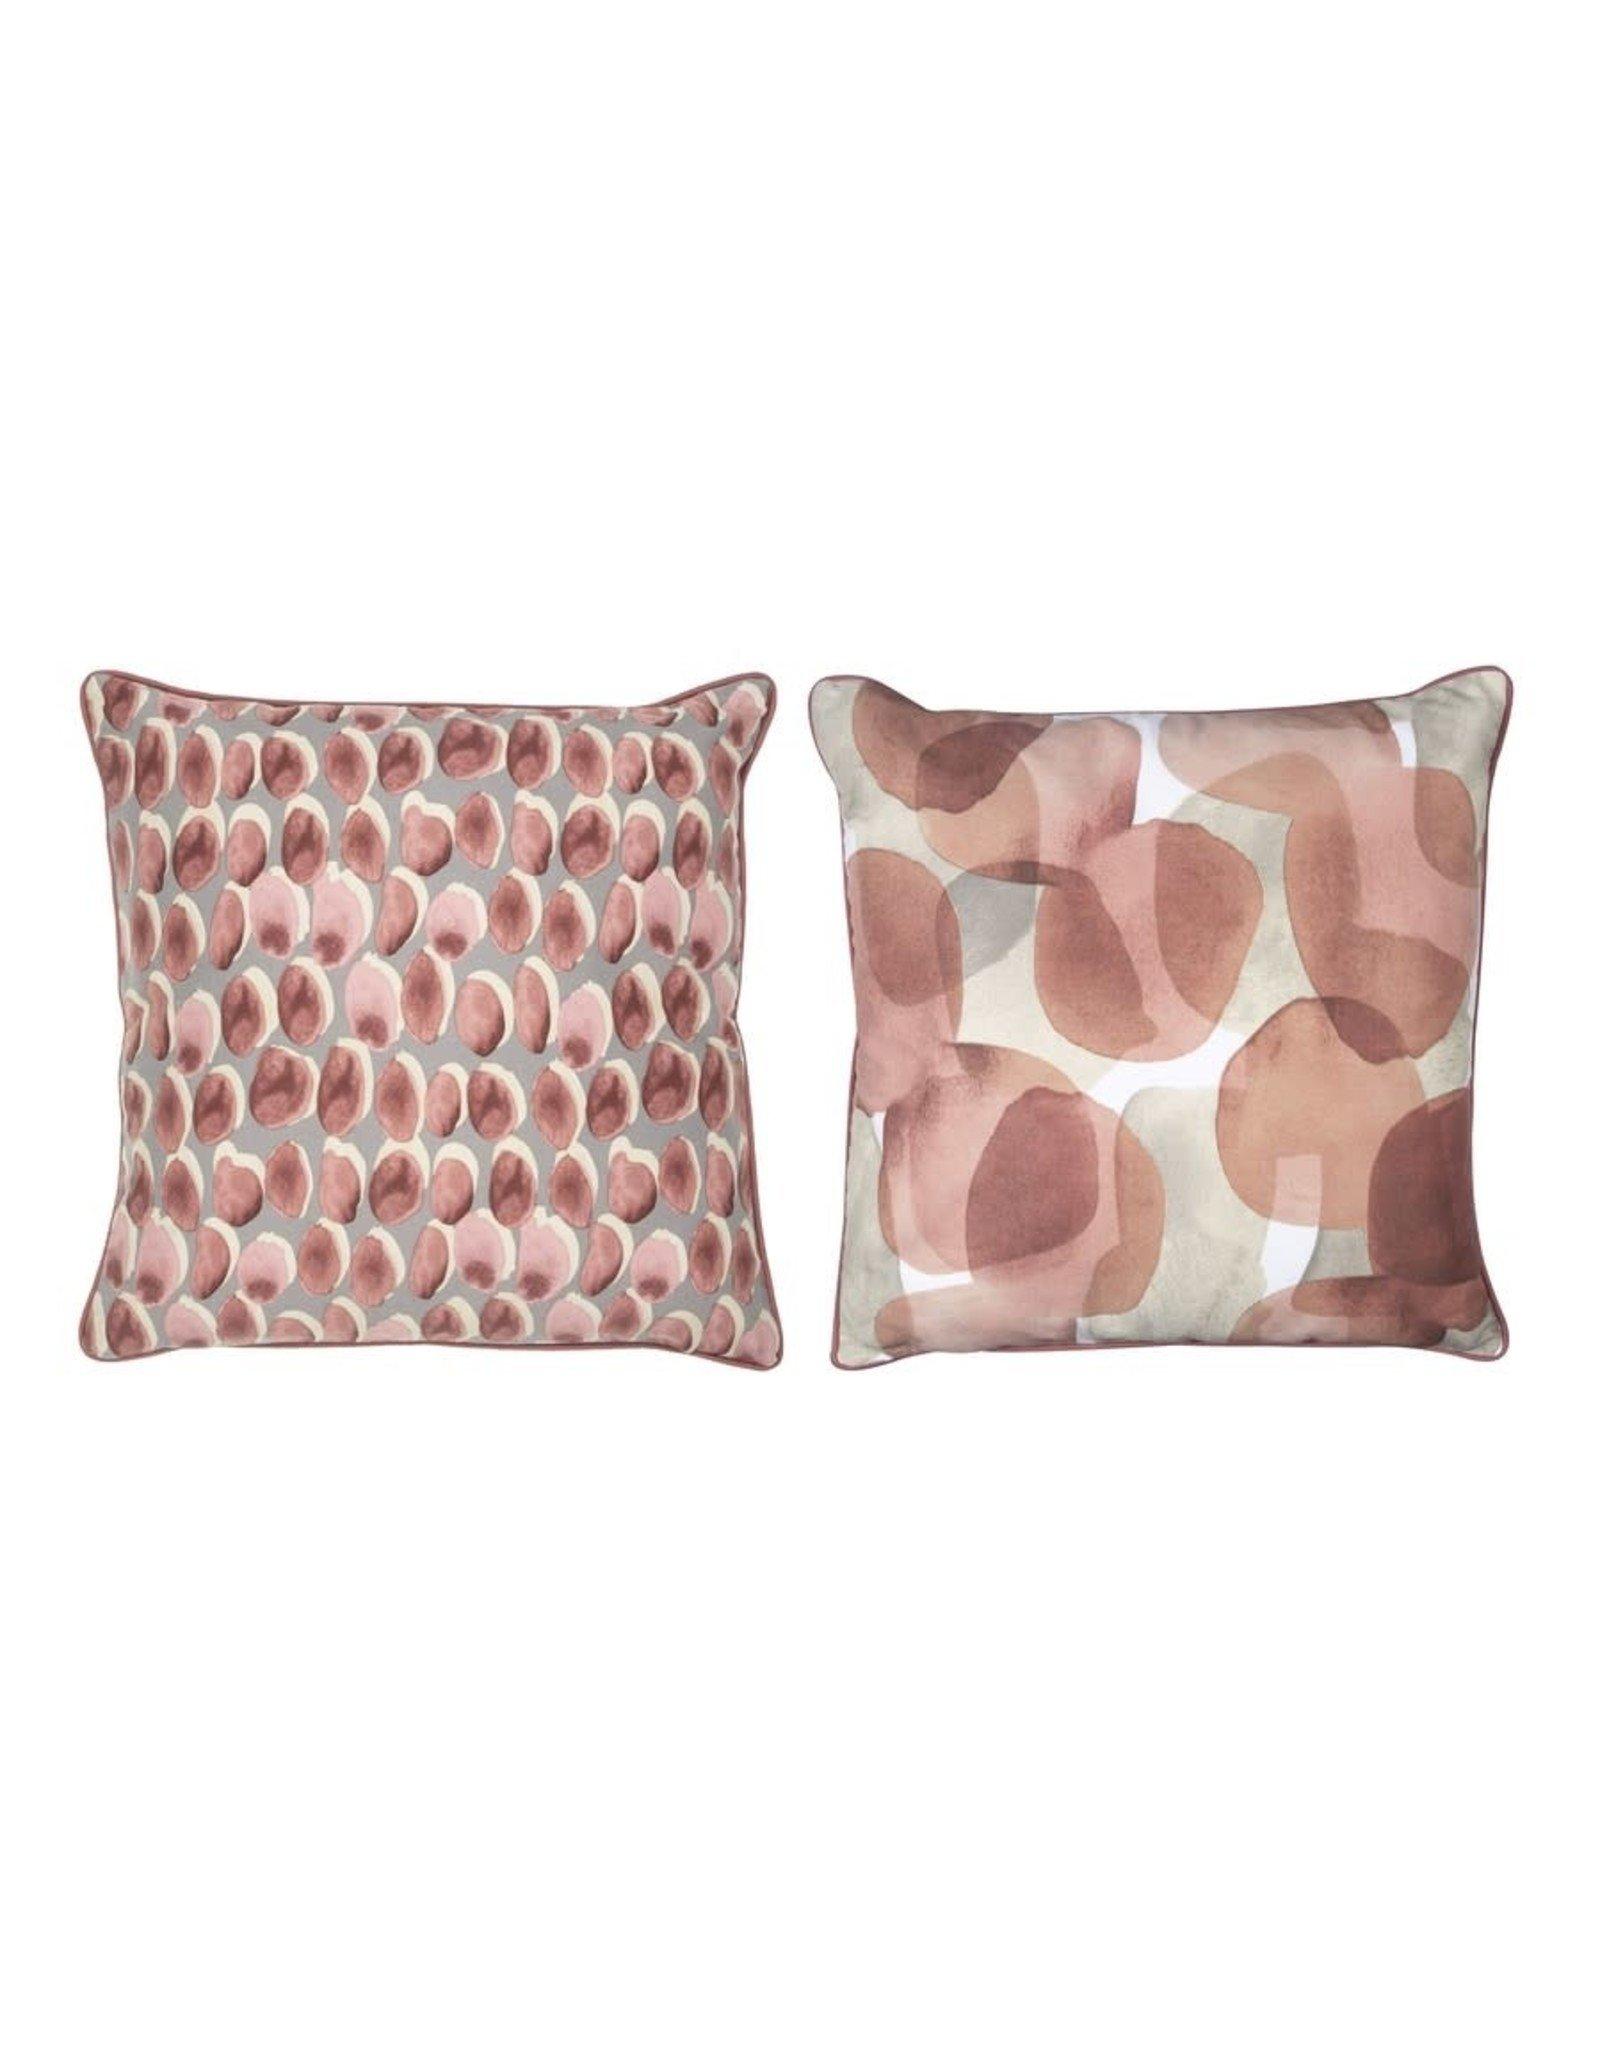 Amalfi Flutter Reversible Cushion 50x50x10cm